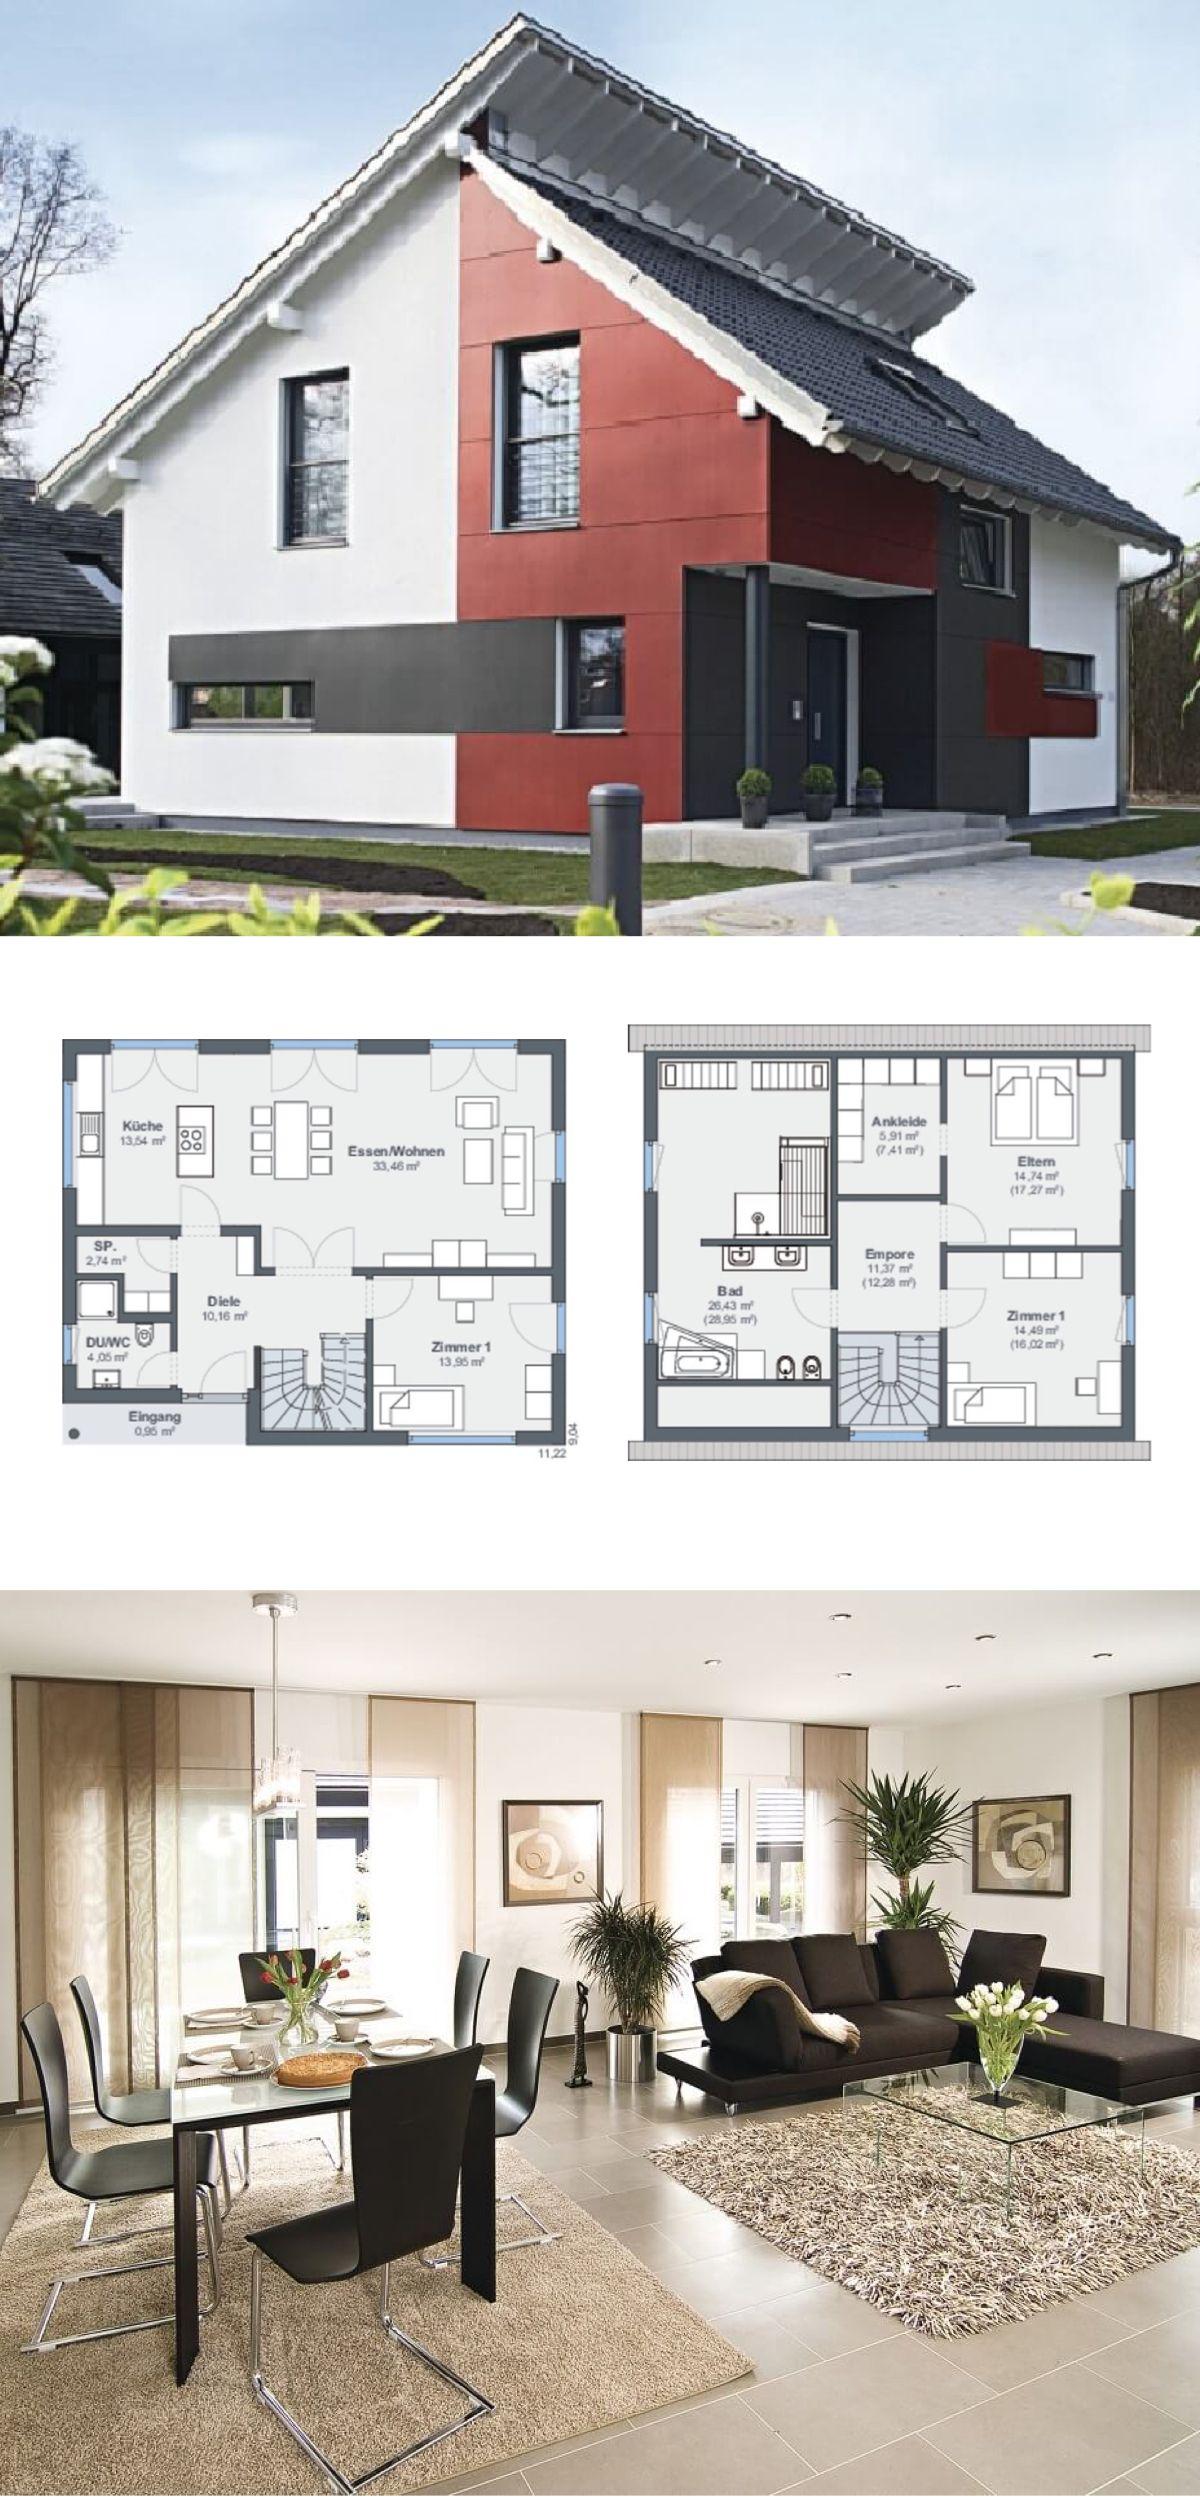 einfamilienhaus mit pultdach versetzt fassade rot wei fertighaus grundriss generation 55 haus 200 weberhaus - Fertighausplne